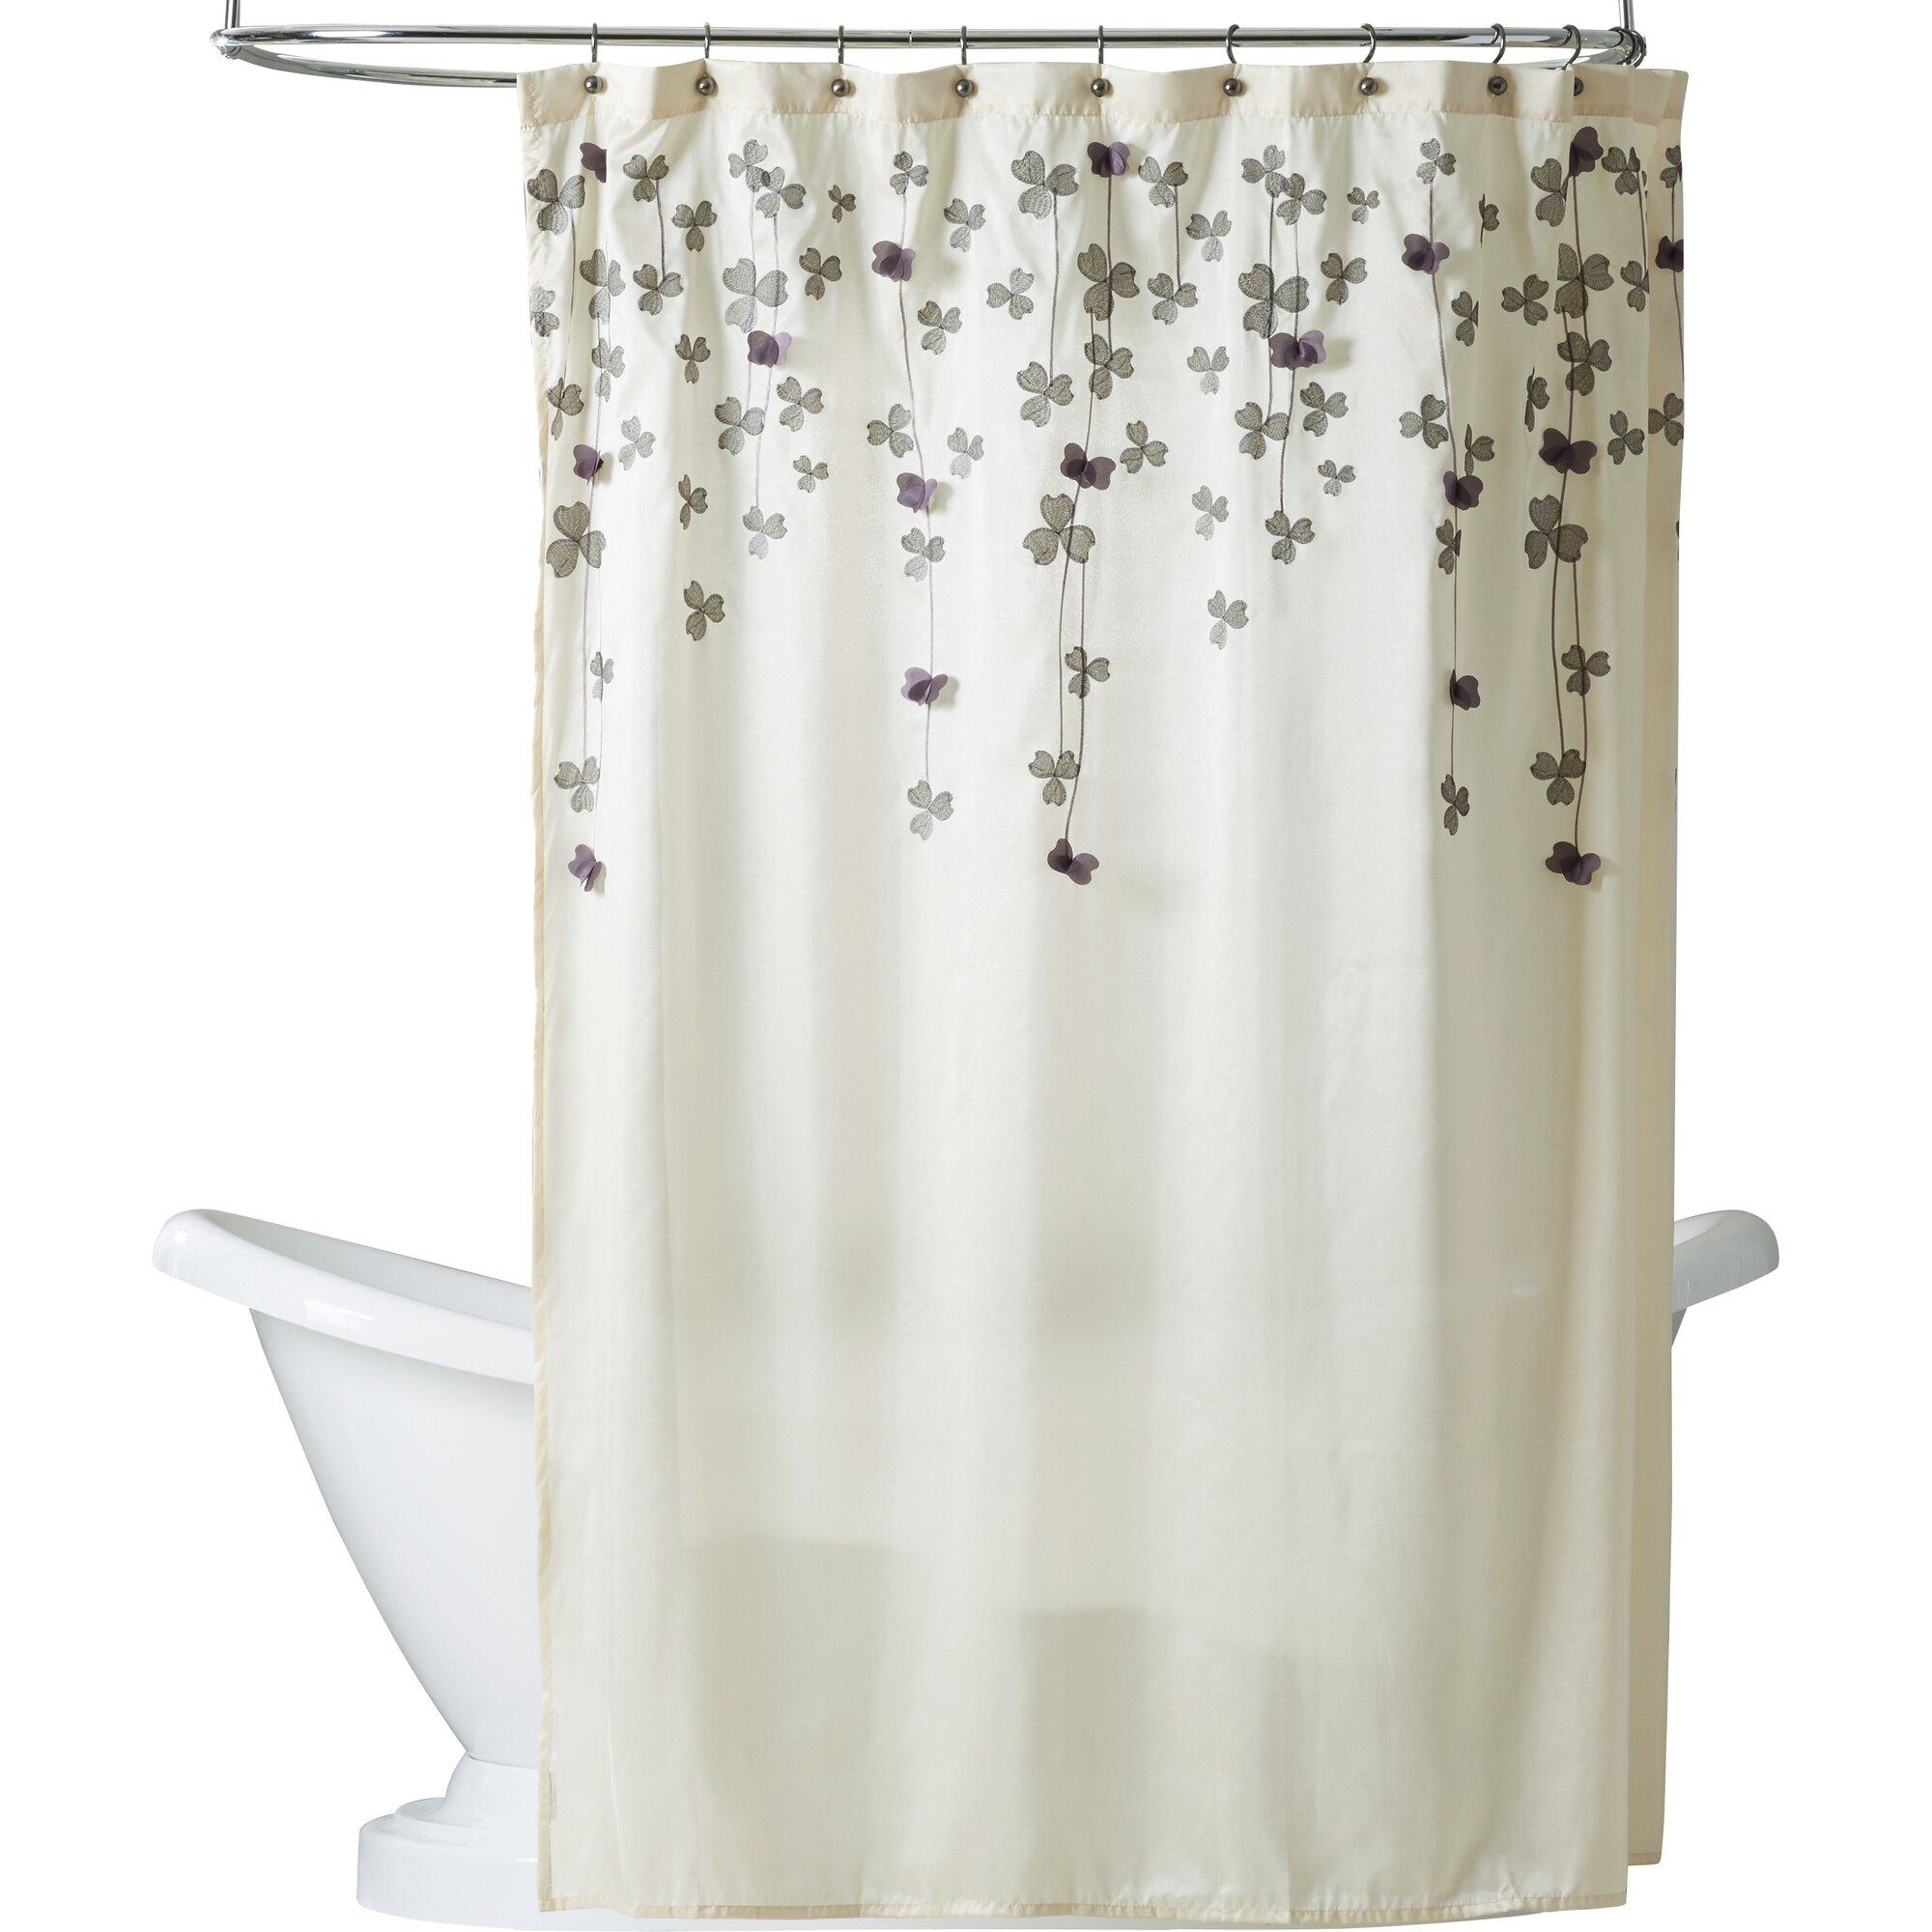 Bamboo shower curtain - Bamboo Shower Curtain 3